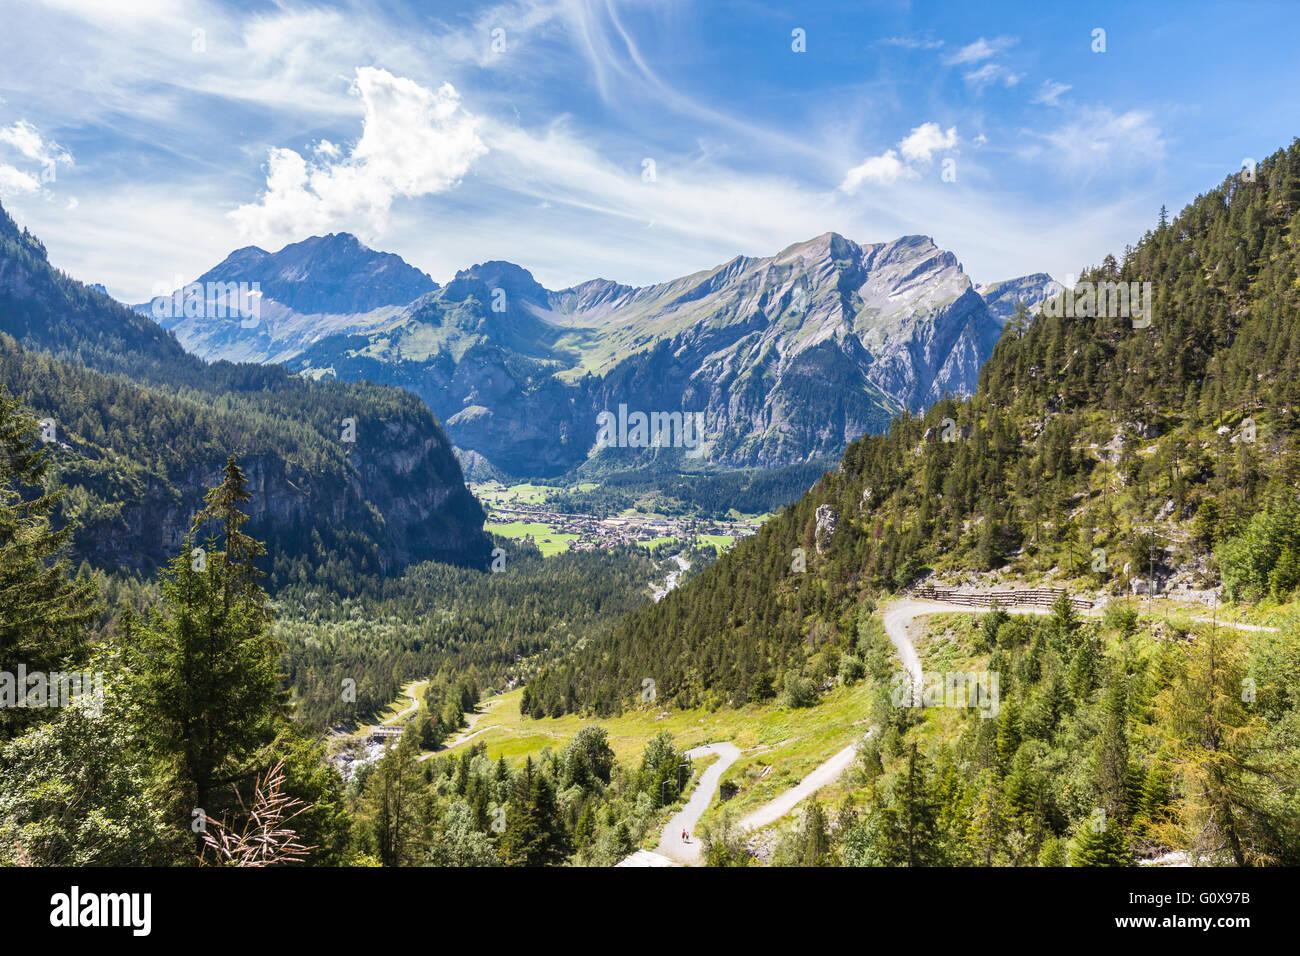 Panorama view of the Alps near Kandersteg on Bernese Oberland in Switzerland - Stock Image